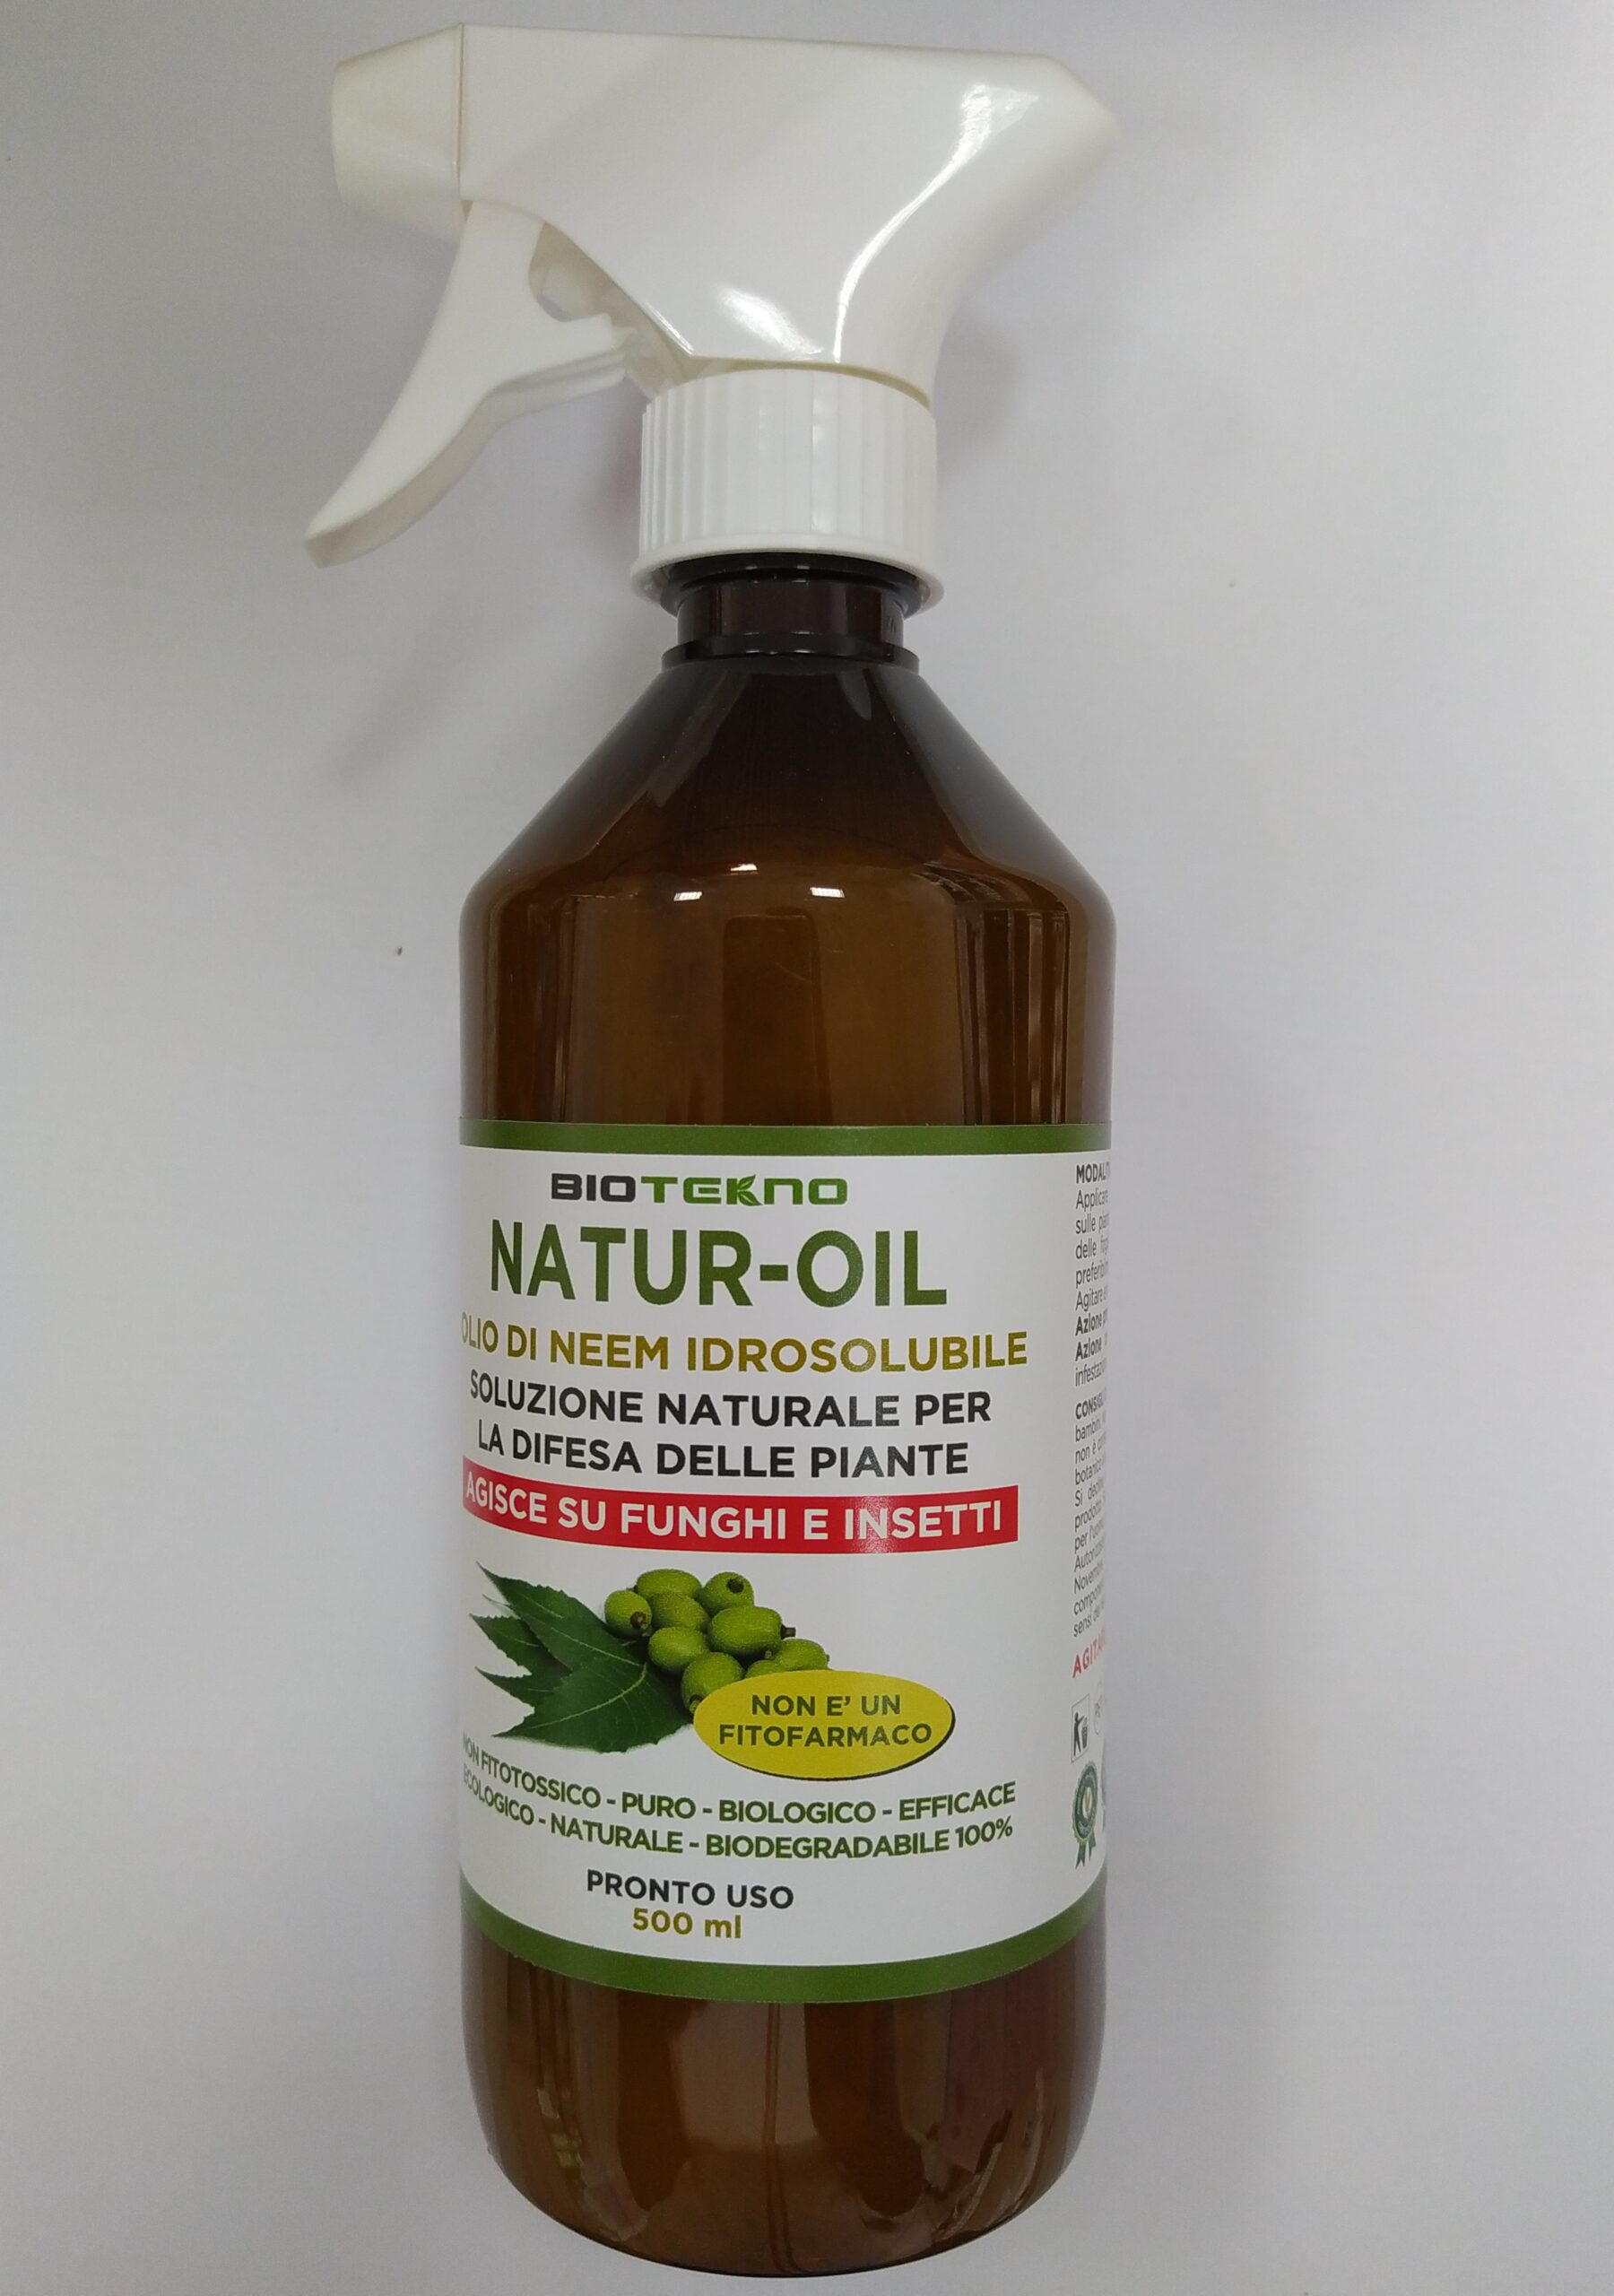 Olio di Neem Idrosolubile per piante – NATUR-OIL BIOTEKNO